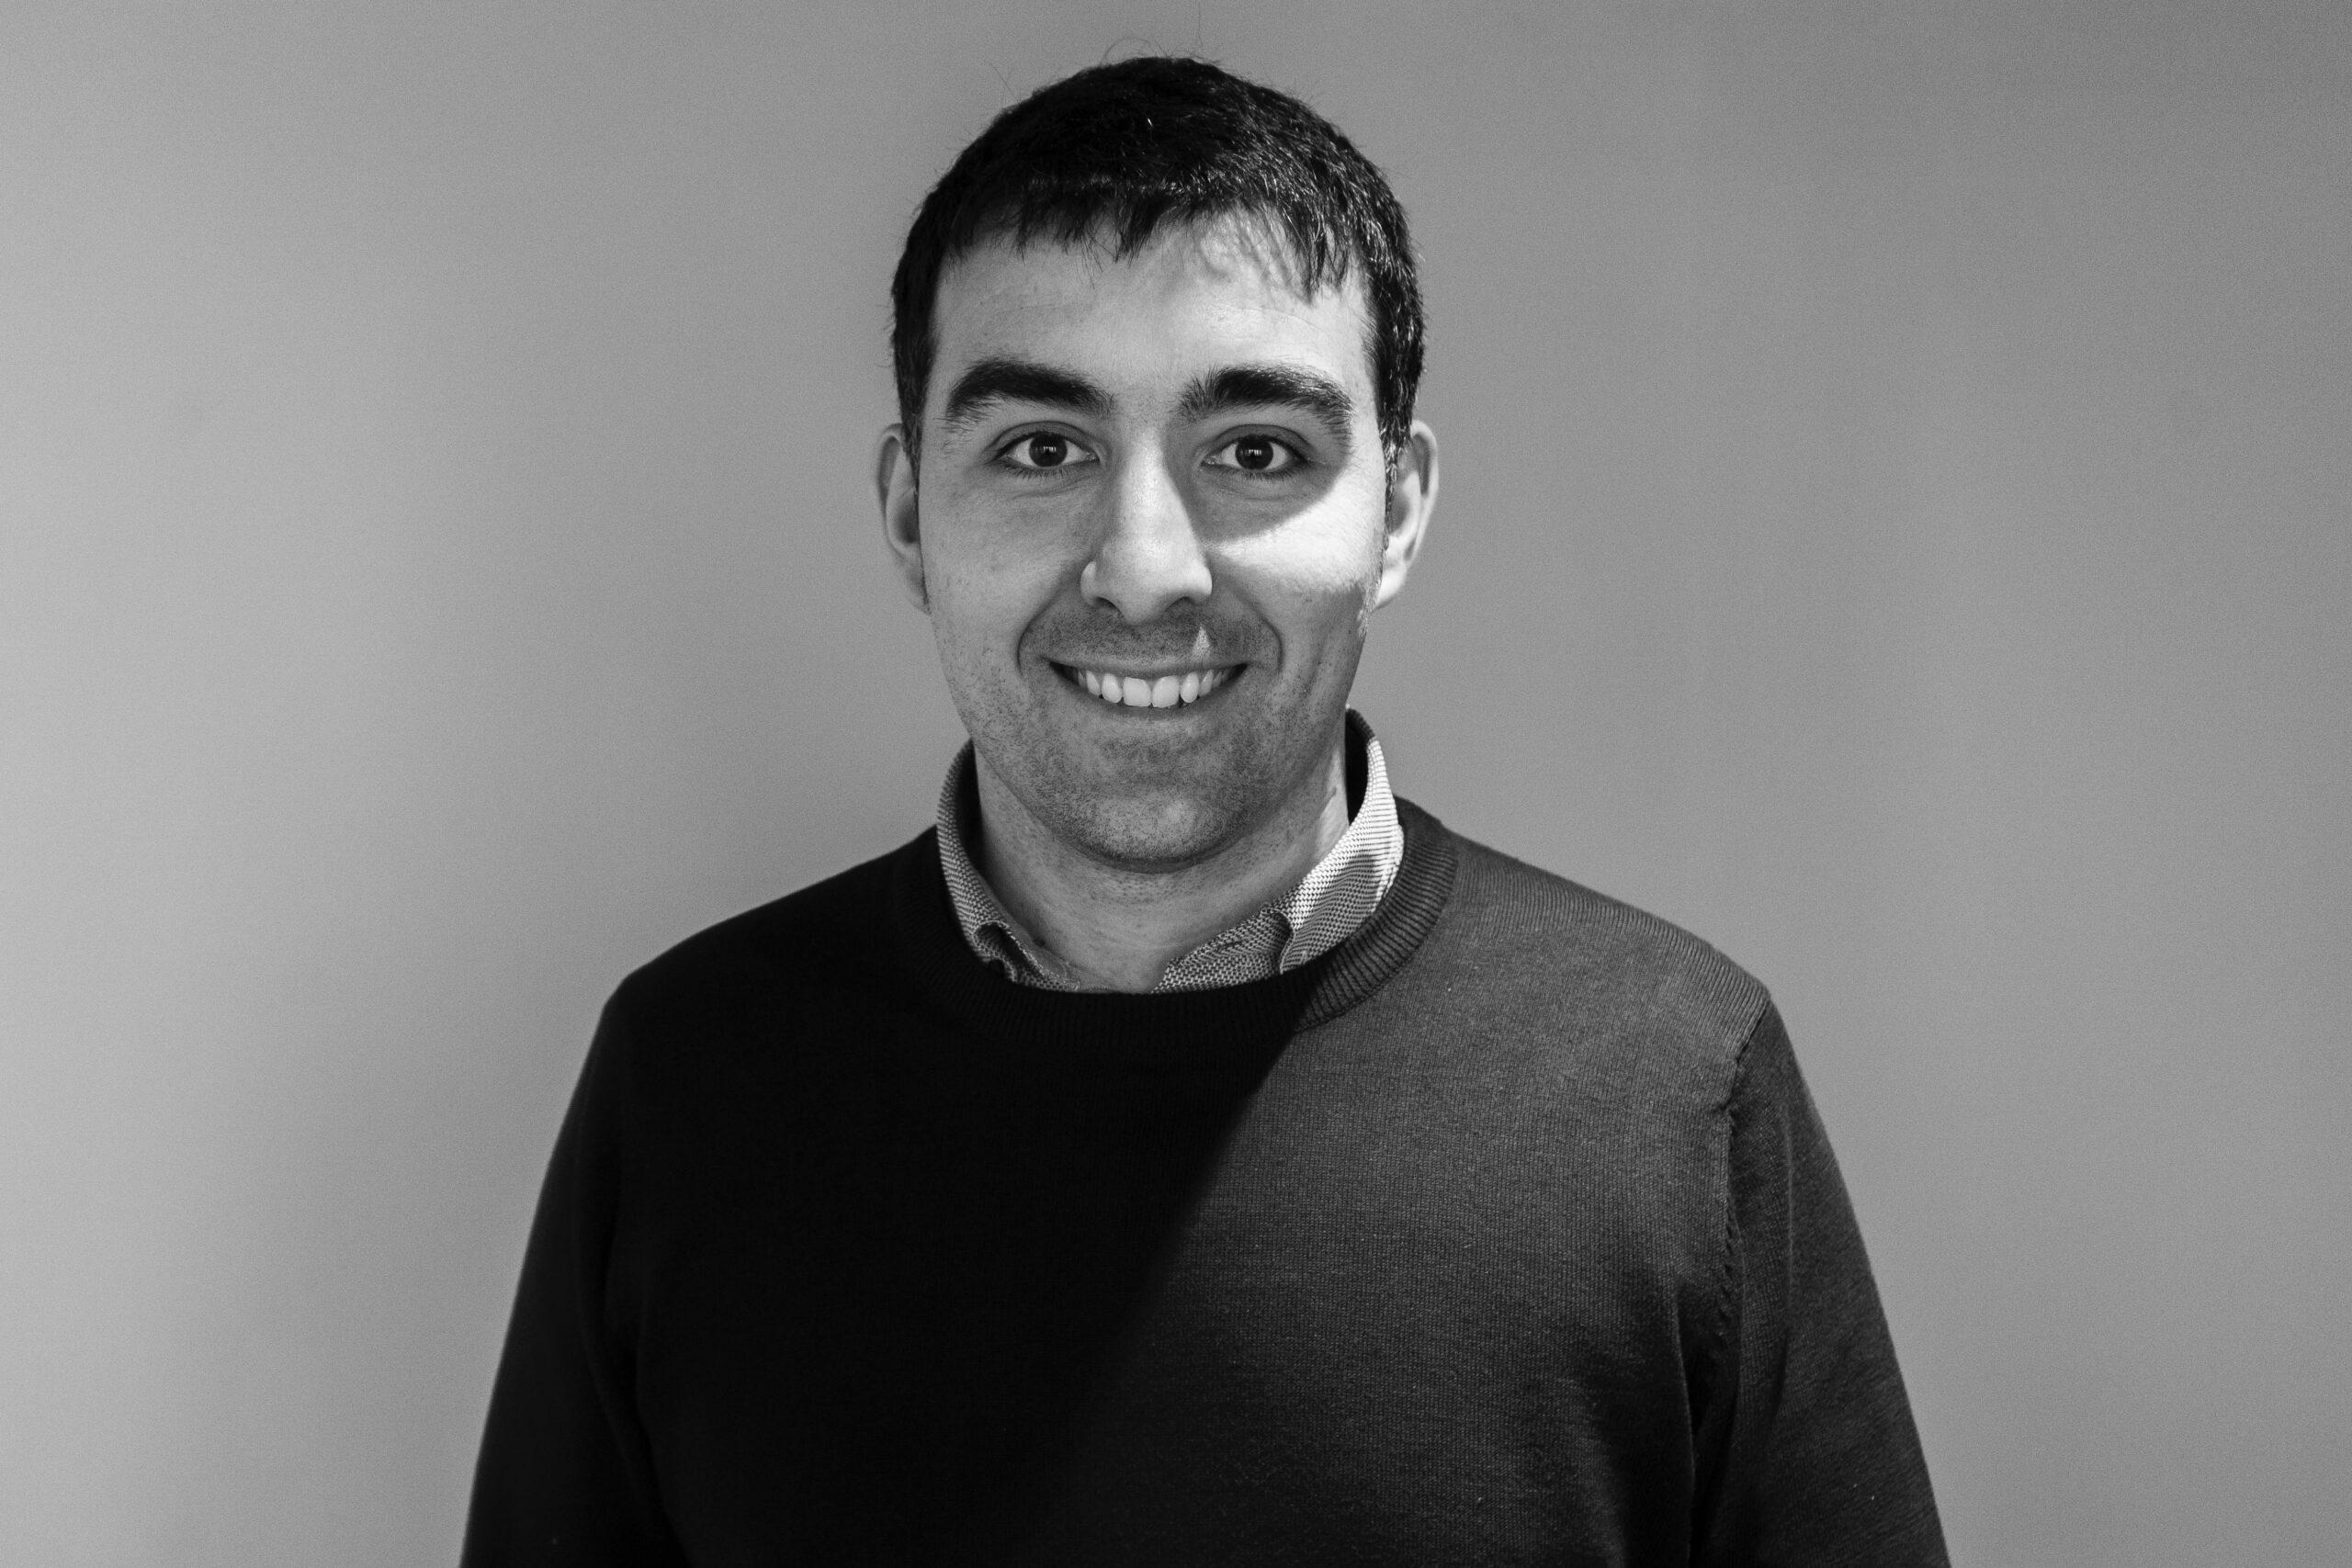 Entrevistamos a Raúl Marín - Socio de Querol Assessors